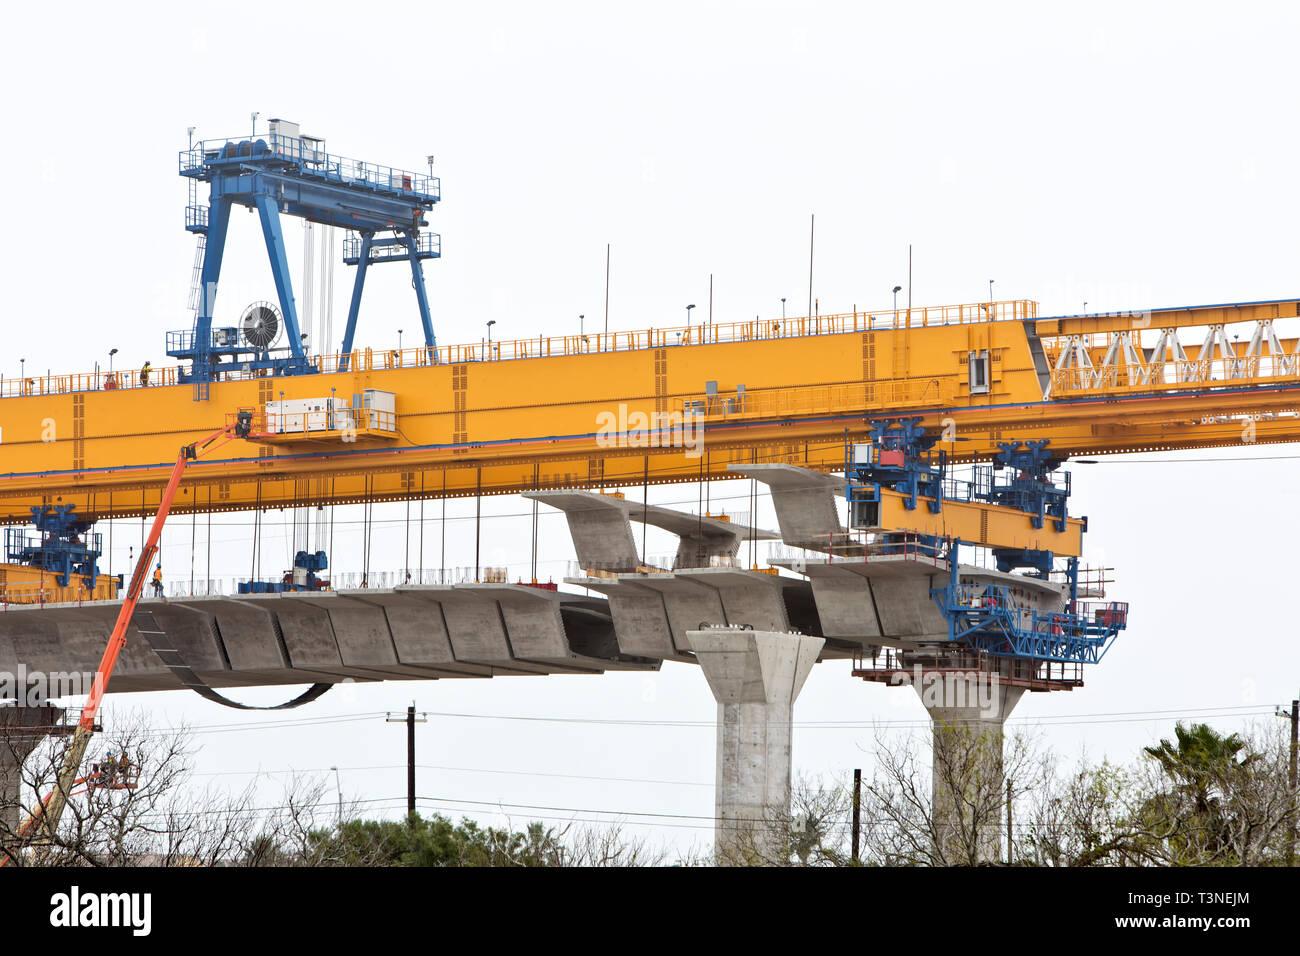 New Harbor Bridge construction, six-lane cable-stay, concrete segmental bridge. - Stock Image